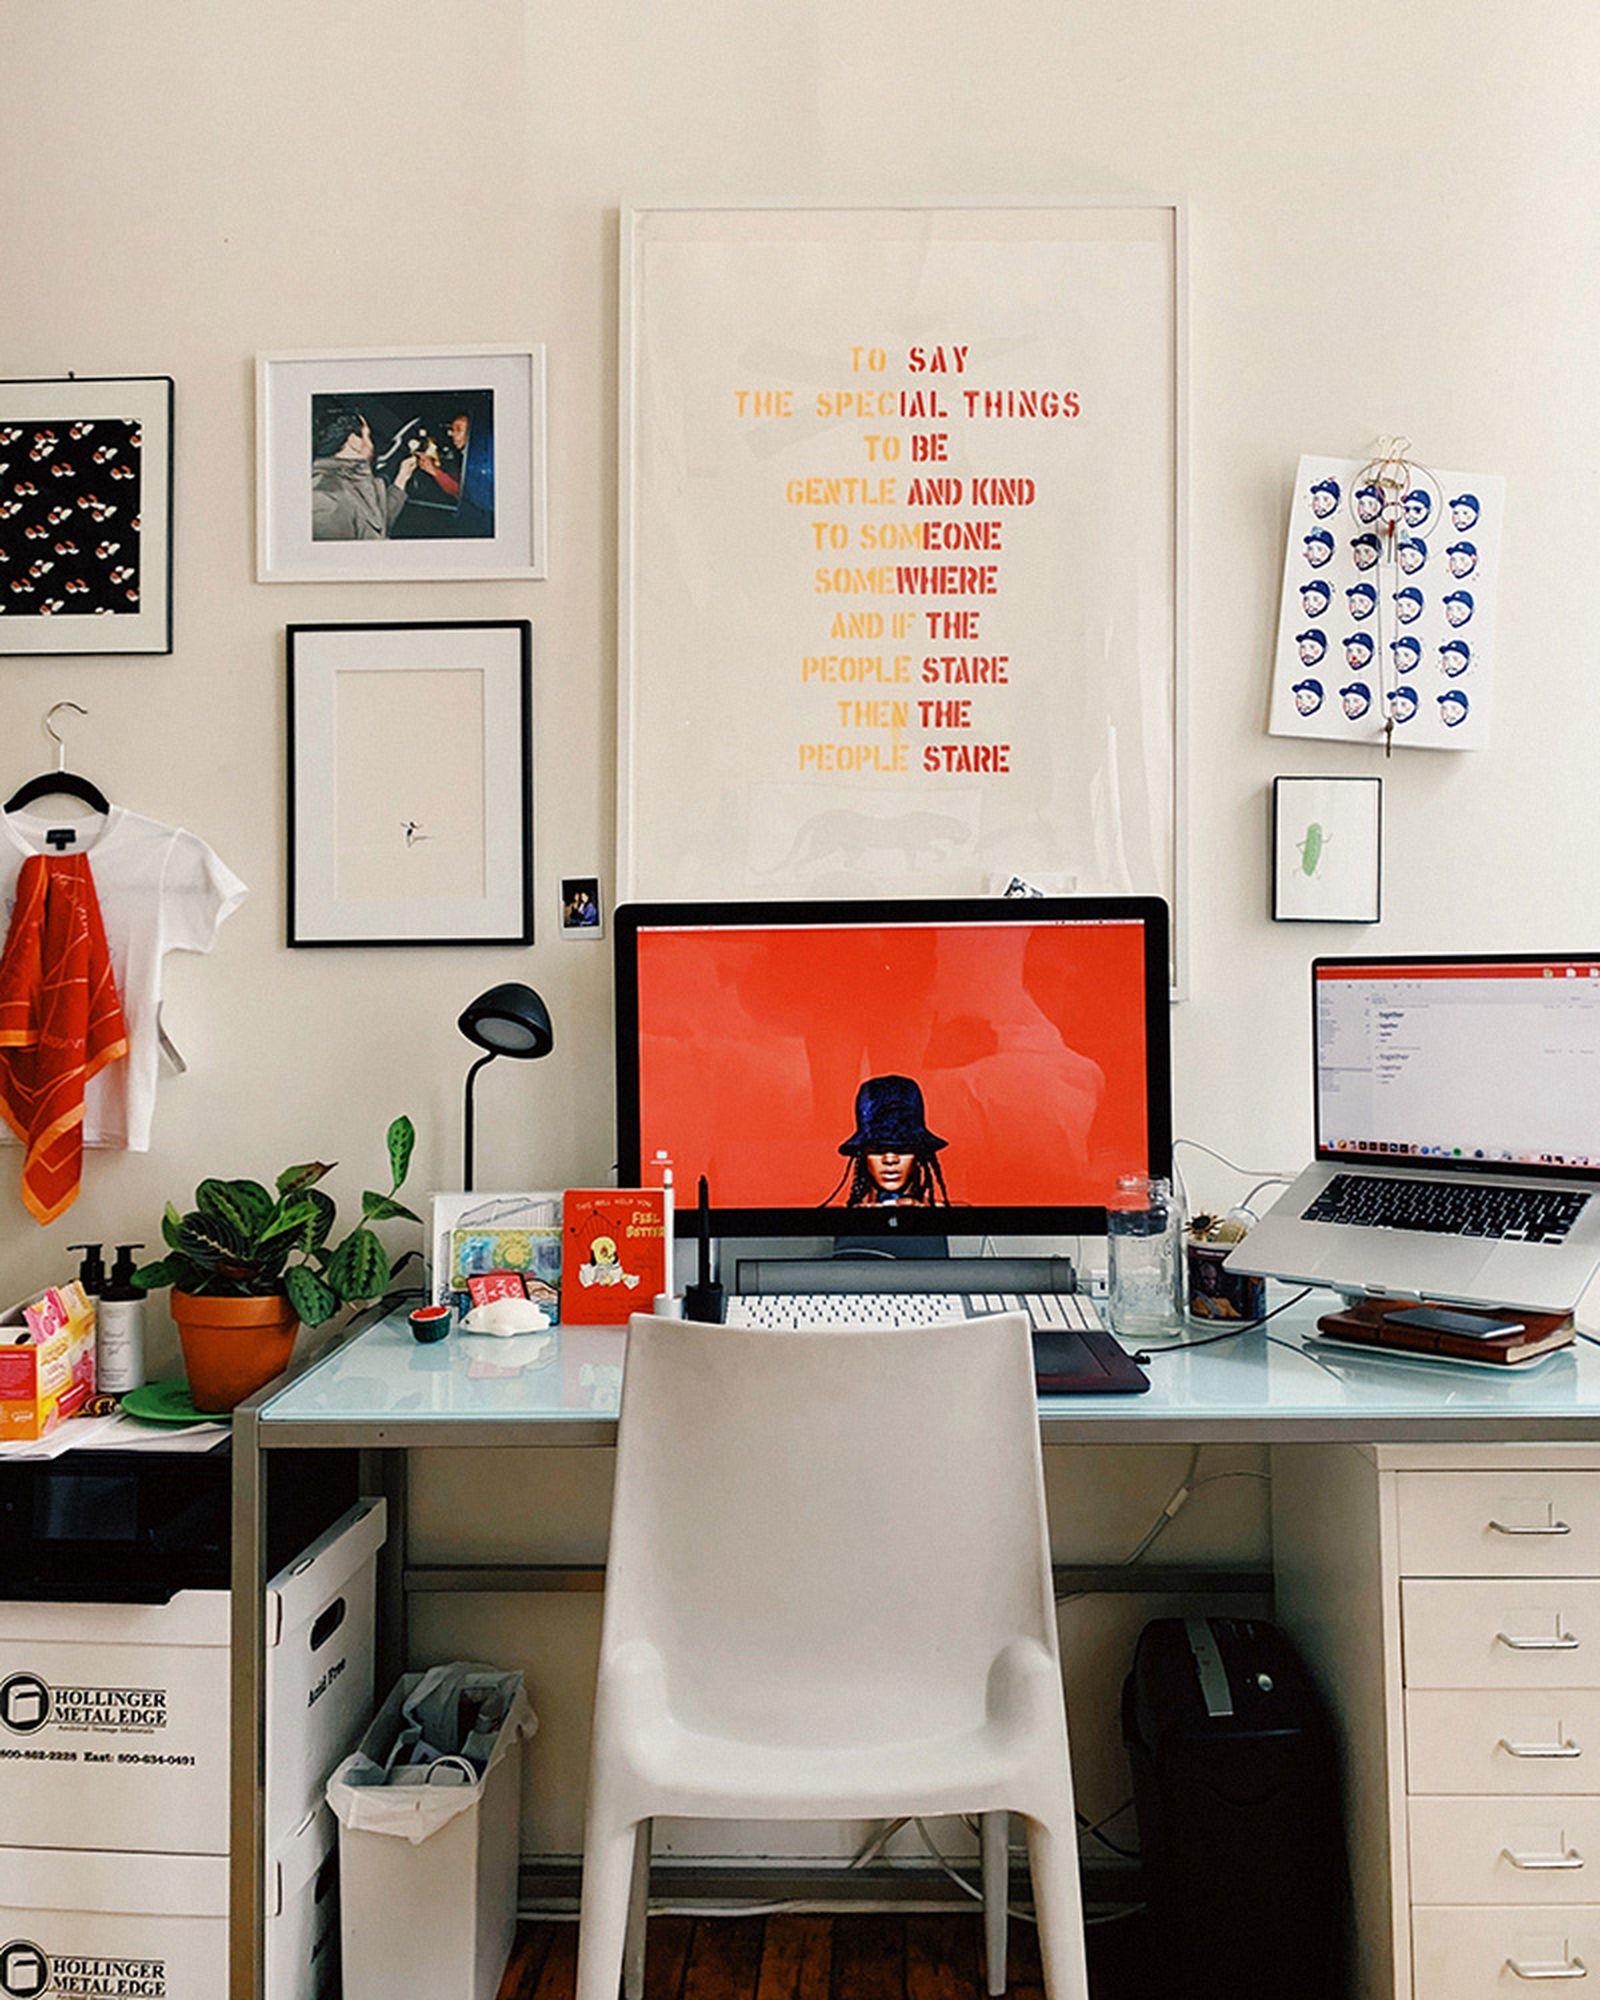 wfh-office-tour-look-inside-home-offices-herbert-naomi-01